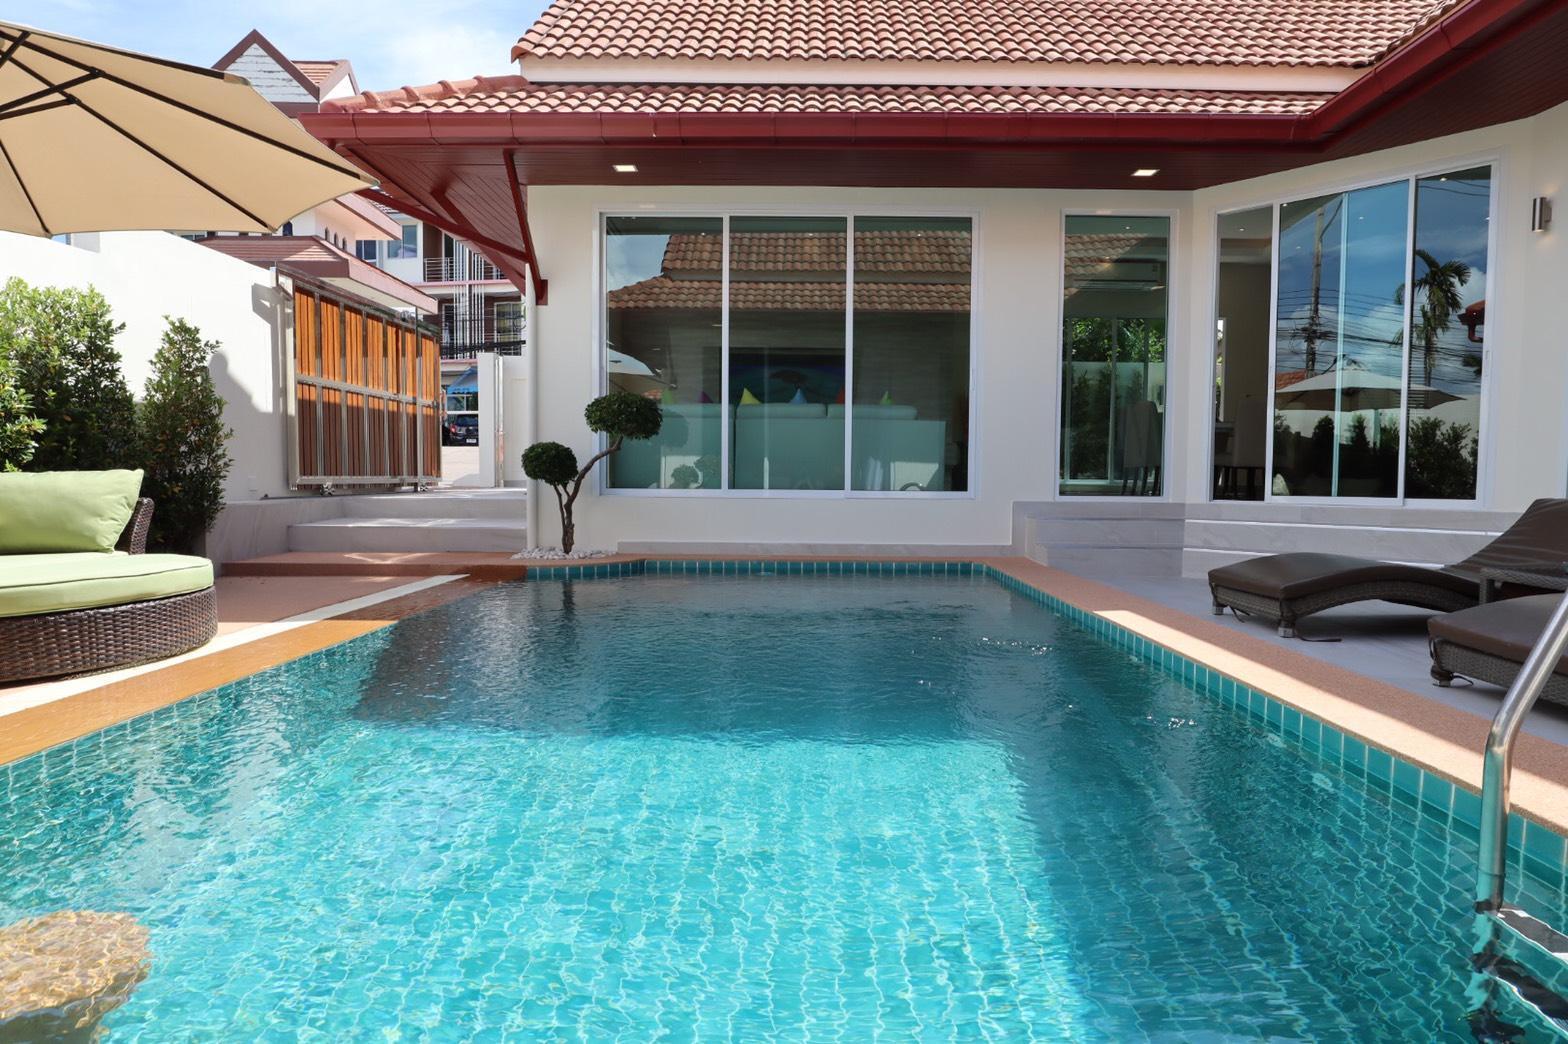 Luxury Pool Villa A14 / 3BR 6-8 persons วิลลา 3 ห้องนอน 4 ห้องน้ำส่วนตัว ขนาด 336 ตร.ม. – เขาตาโล